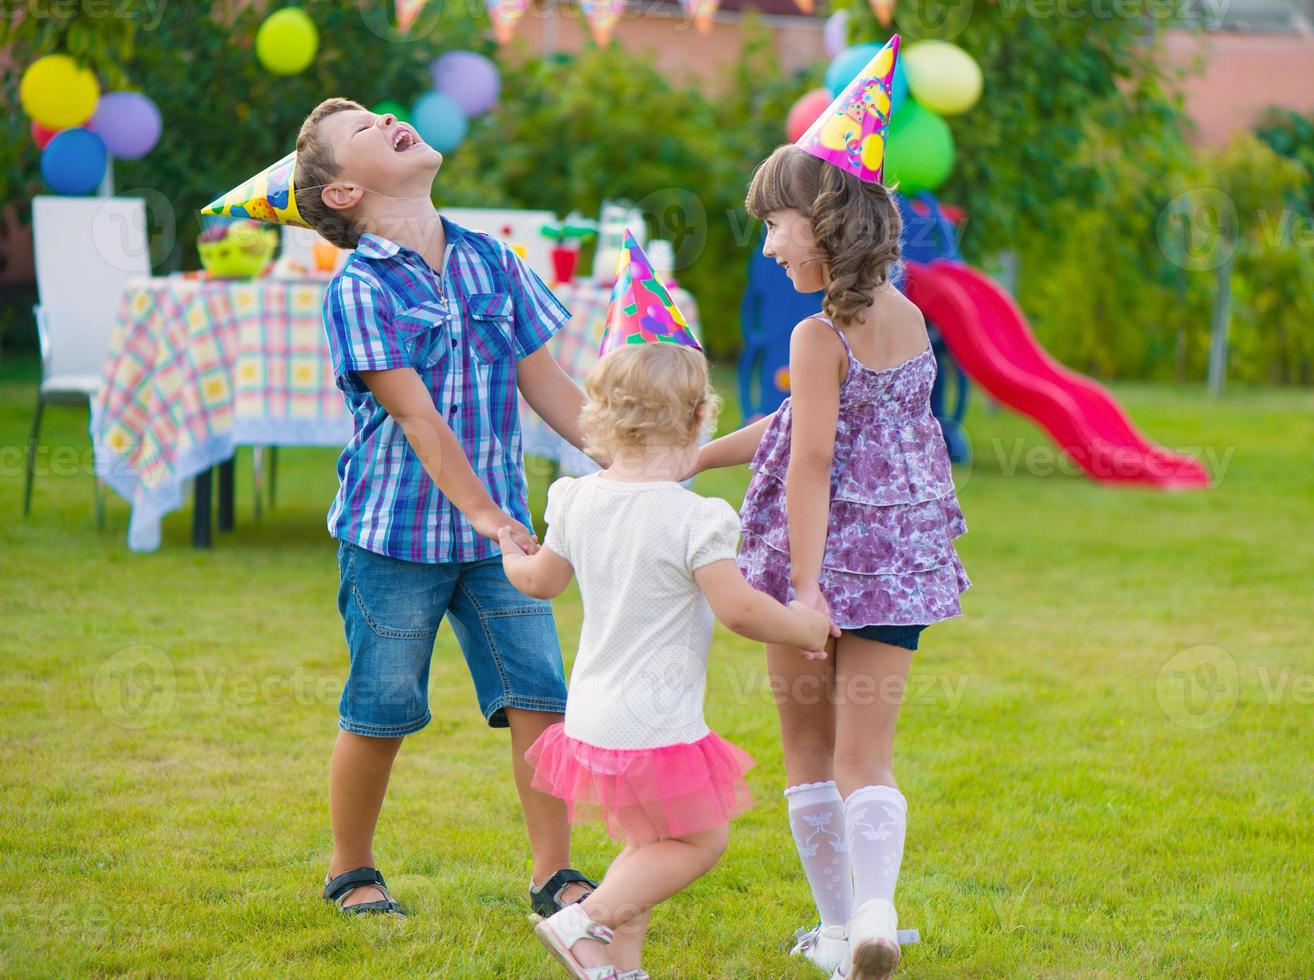 Kindergeburtstagsfeier foto